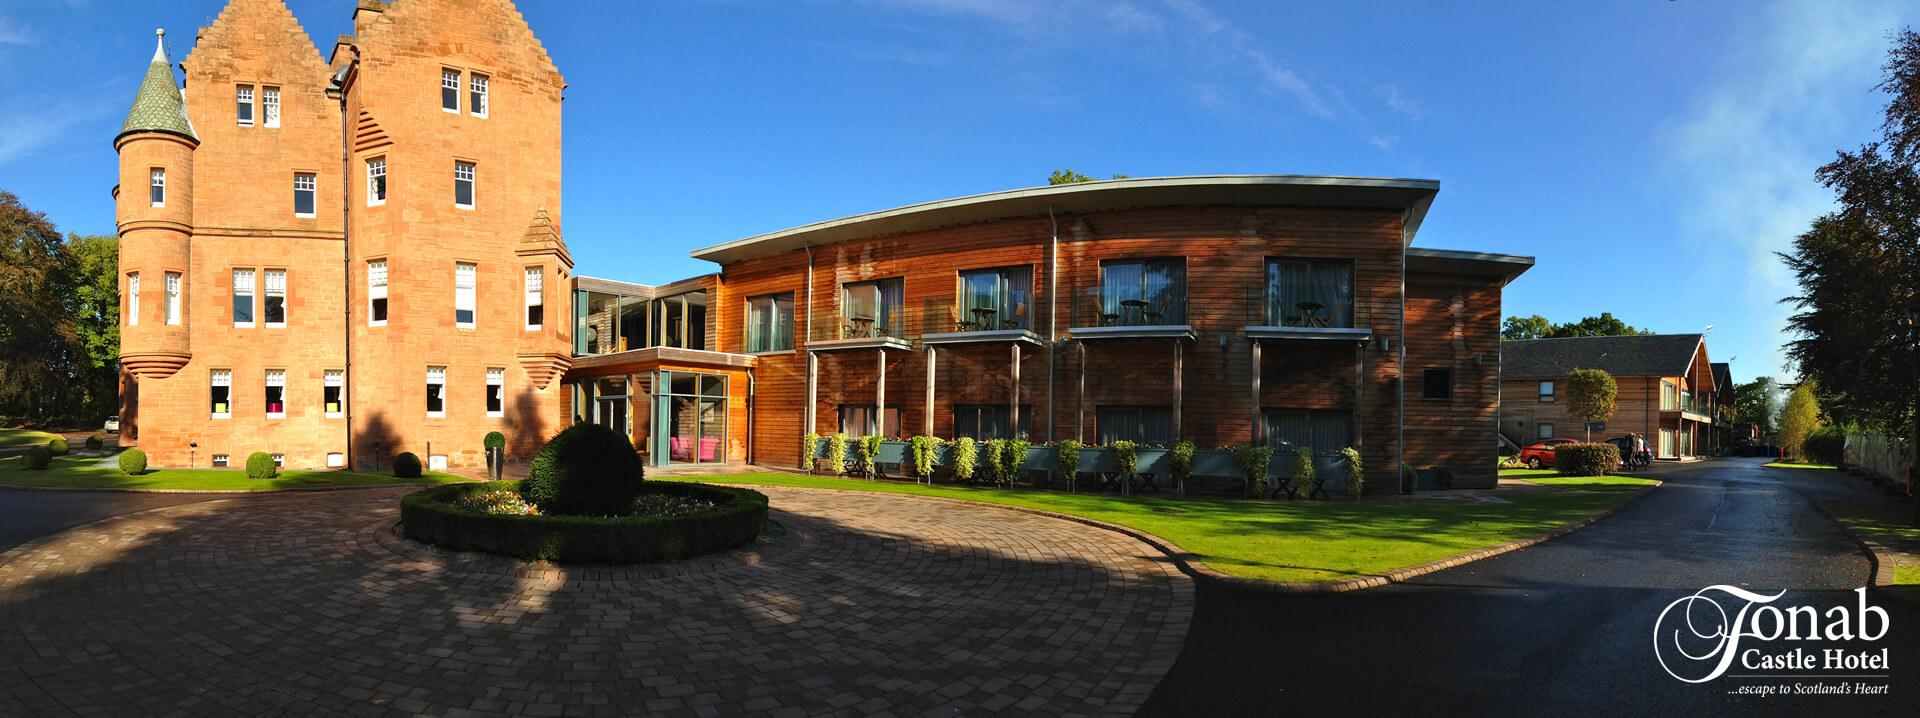 Fonab Castle Hotel Scotland S Newest Aa 5 Star In The Heart Of